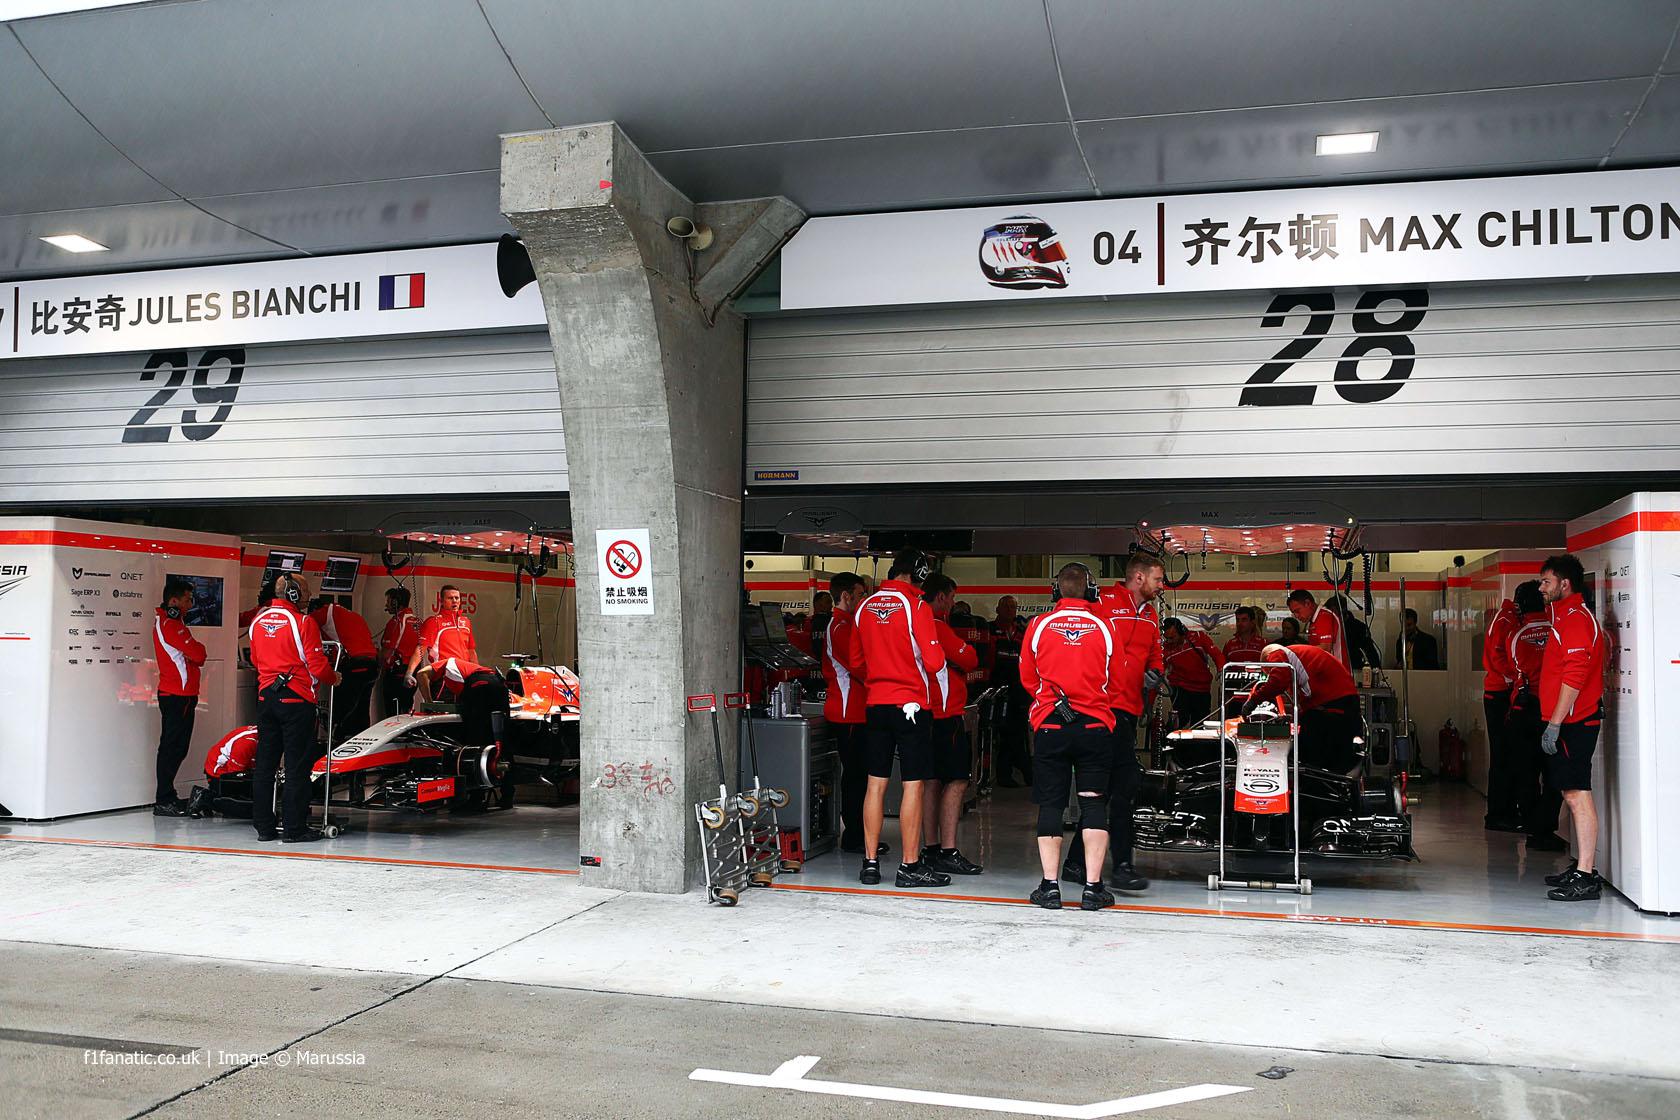 Jules Bianchi, Max Chilton, Marussia, Shanghai International Circuit, 2014